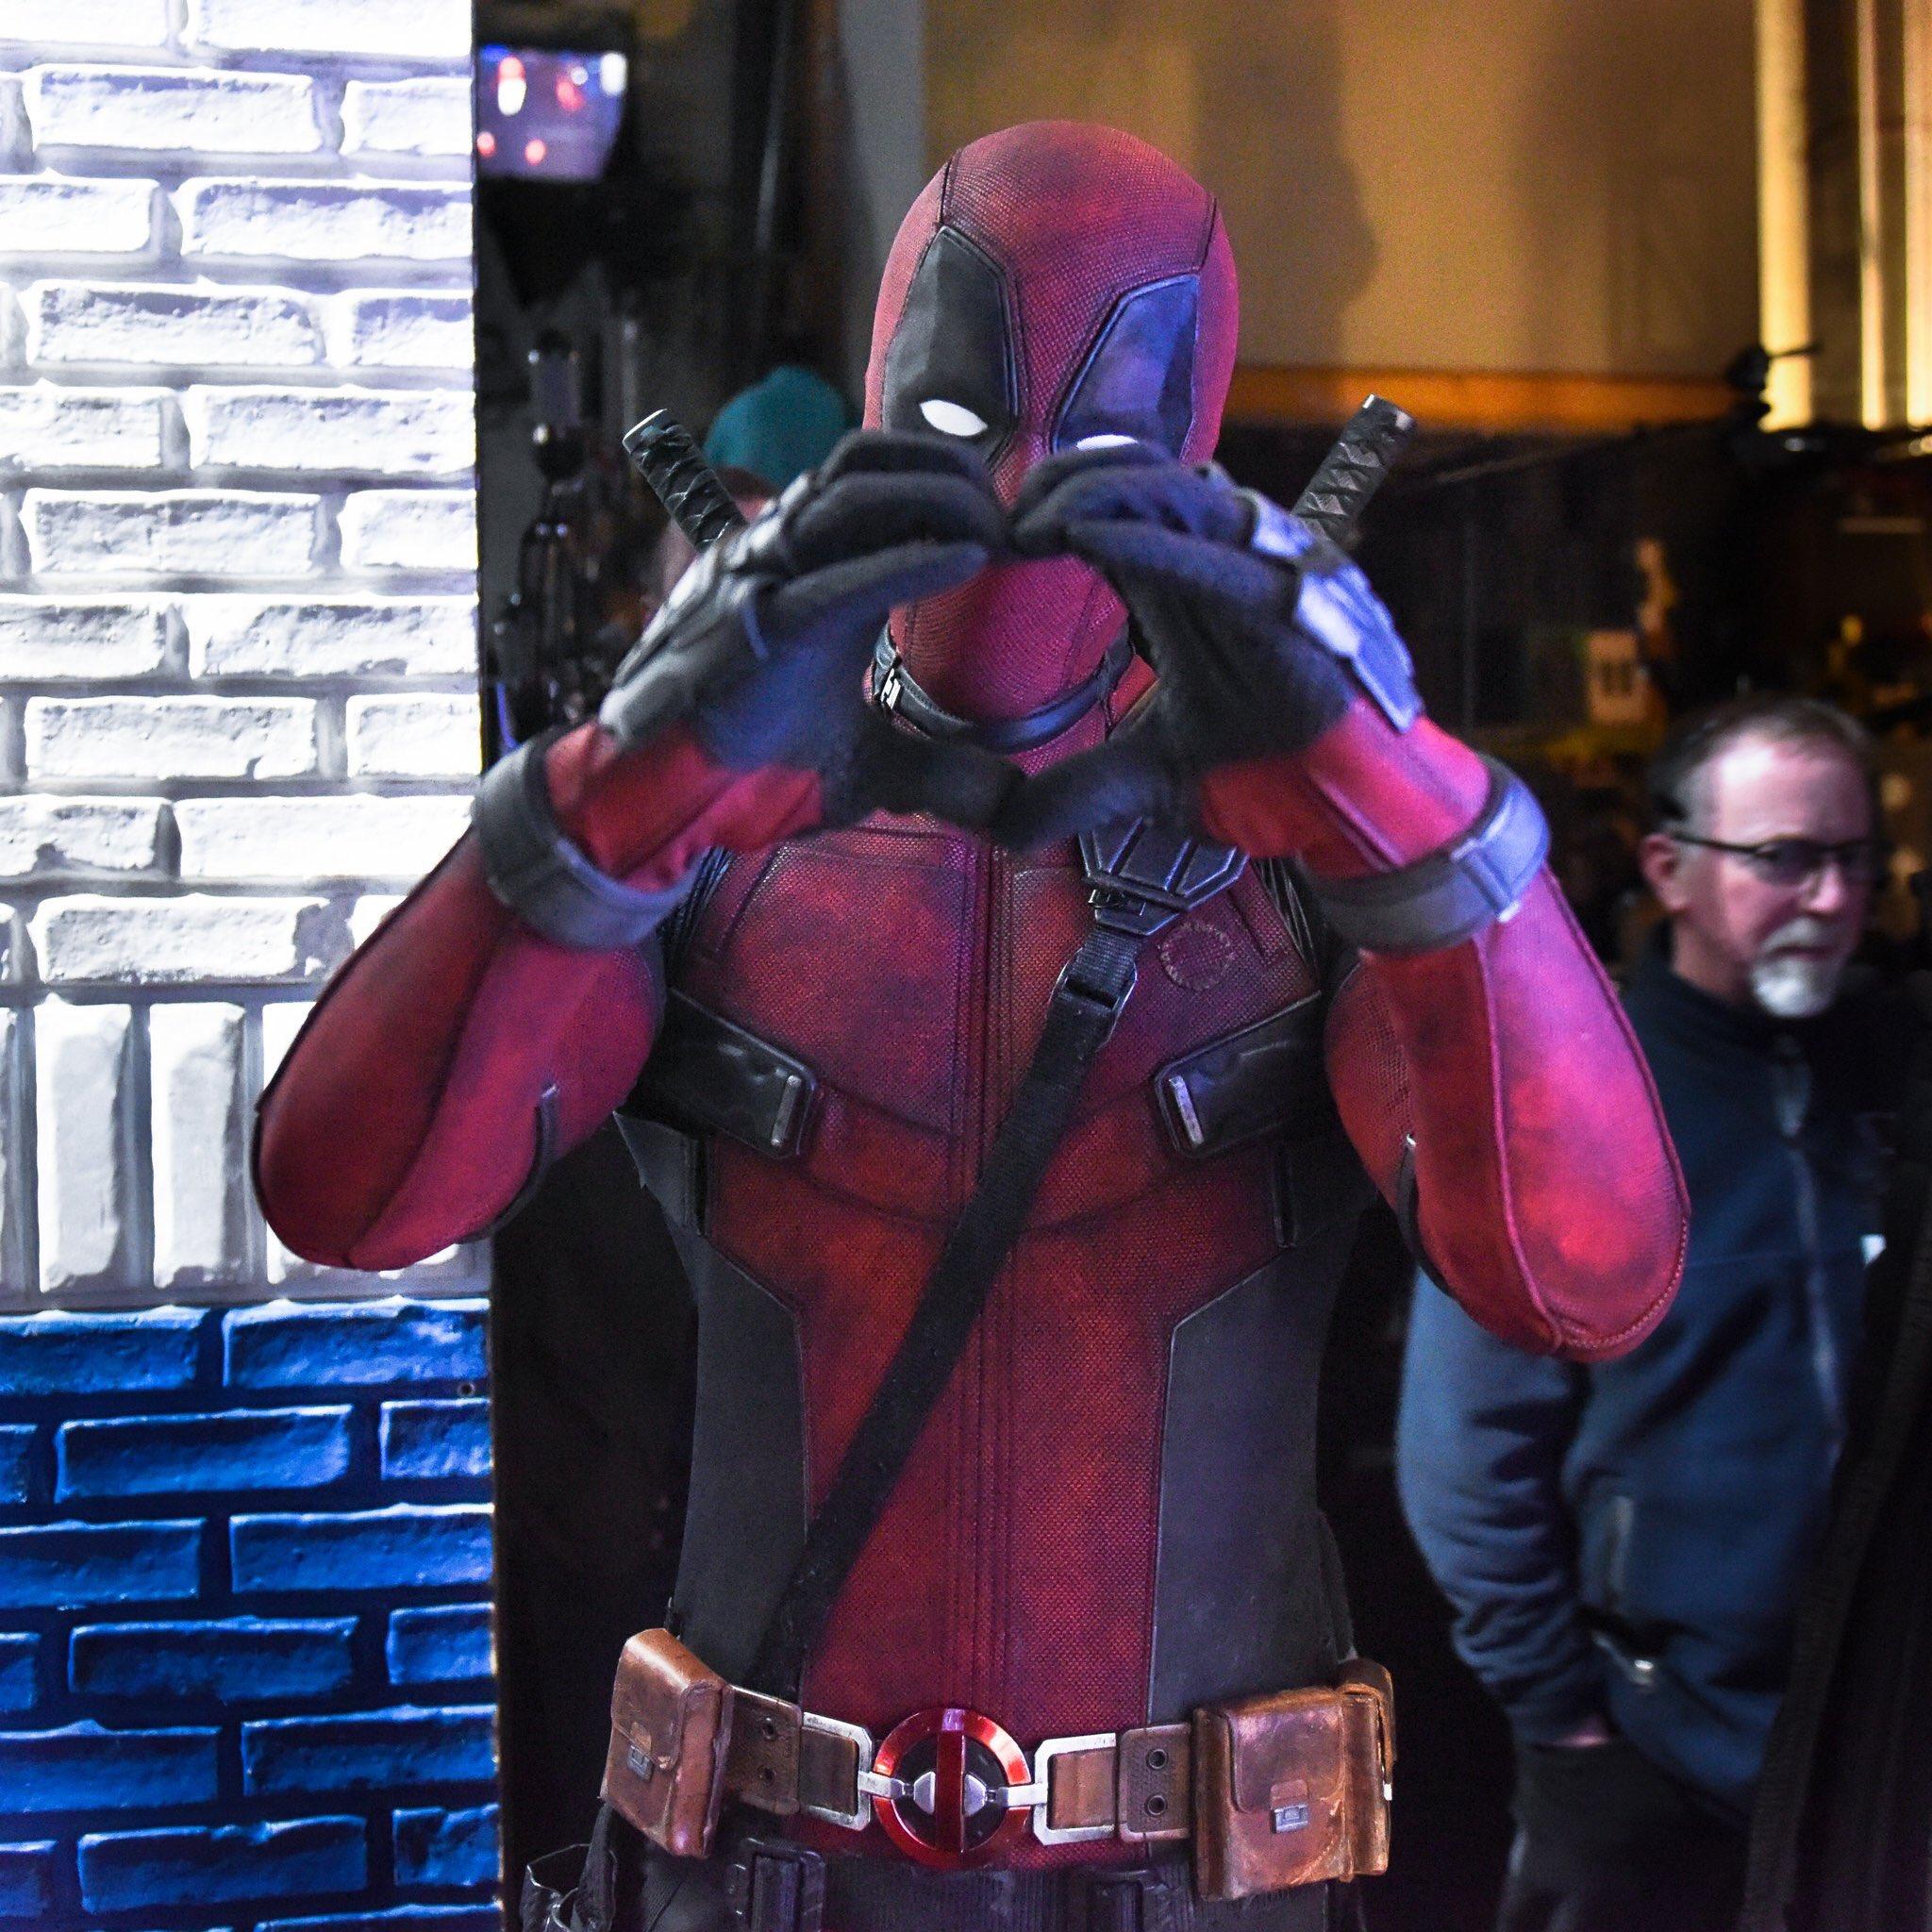 Tonight! Lighthearted high jinks with Deadpool! (Seen hear strangling Vanisher.) @deadpoolmovie #LSSC https://t.co/wgTkkDjD5q